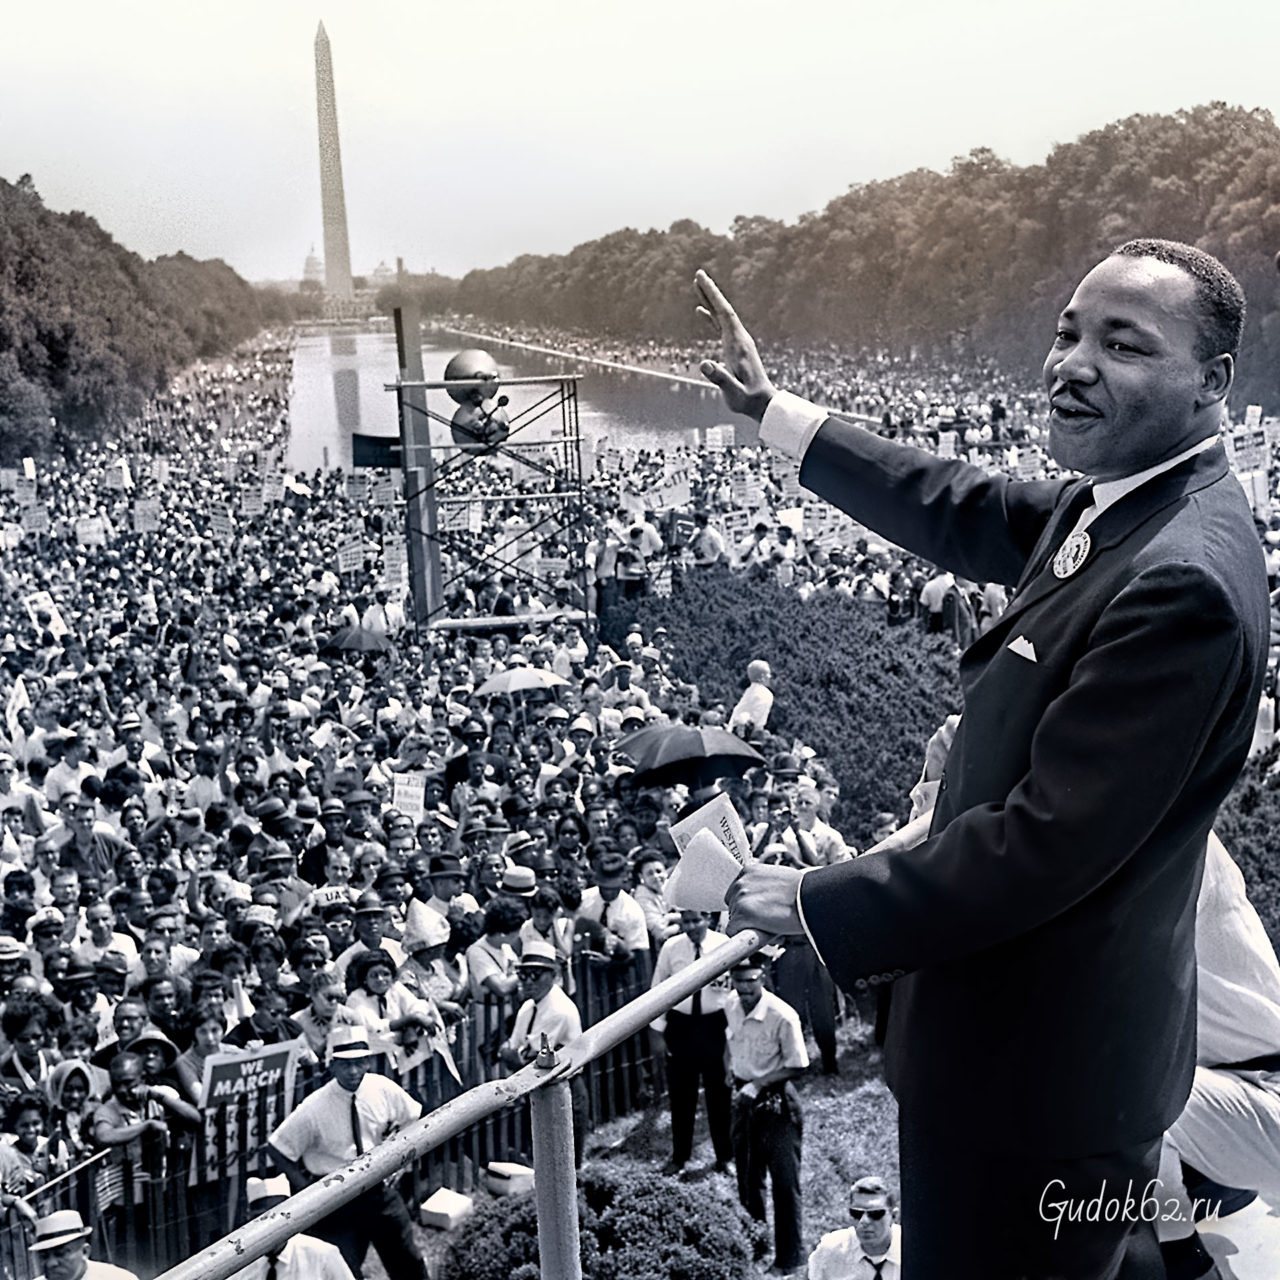 В Нью-Йорке бастуют мусорщики, Мартин Лютер Кинг незадолго до убийства